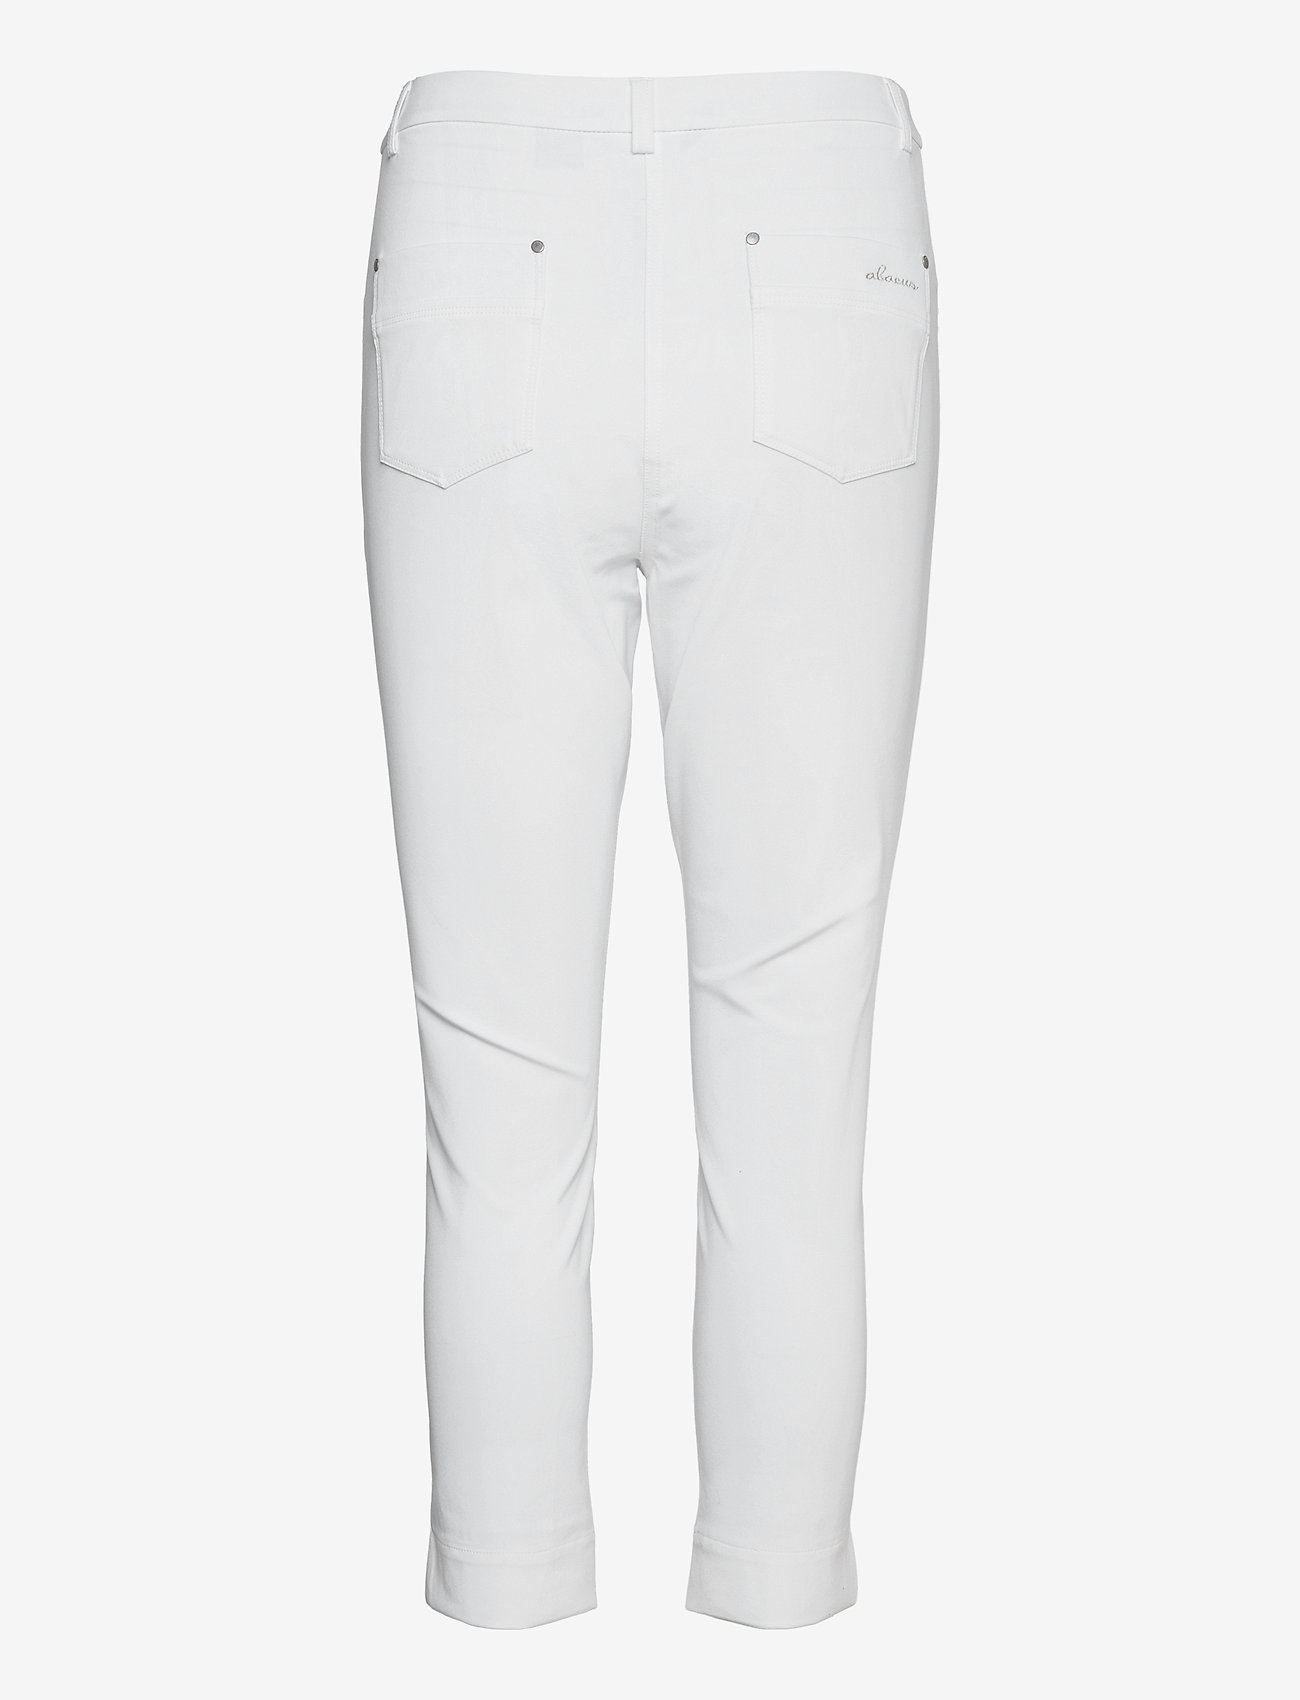 Abacus - Lds Grace high waist 7/8 trousers 92cm - golfbroeken - white - 1